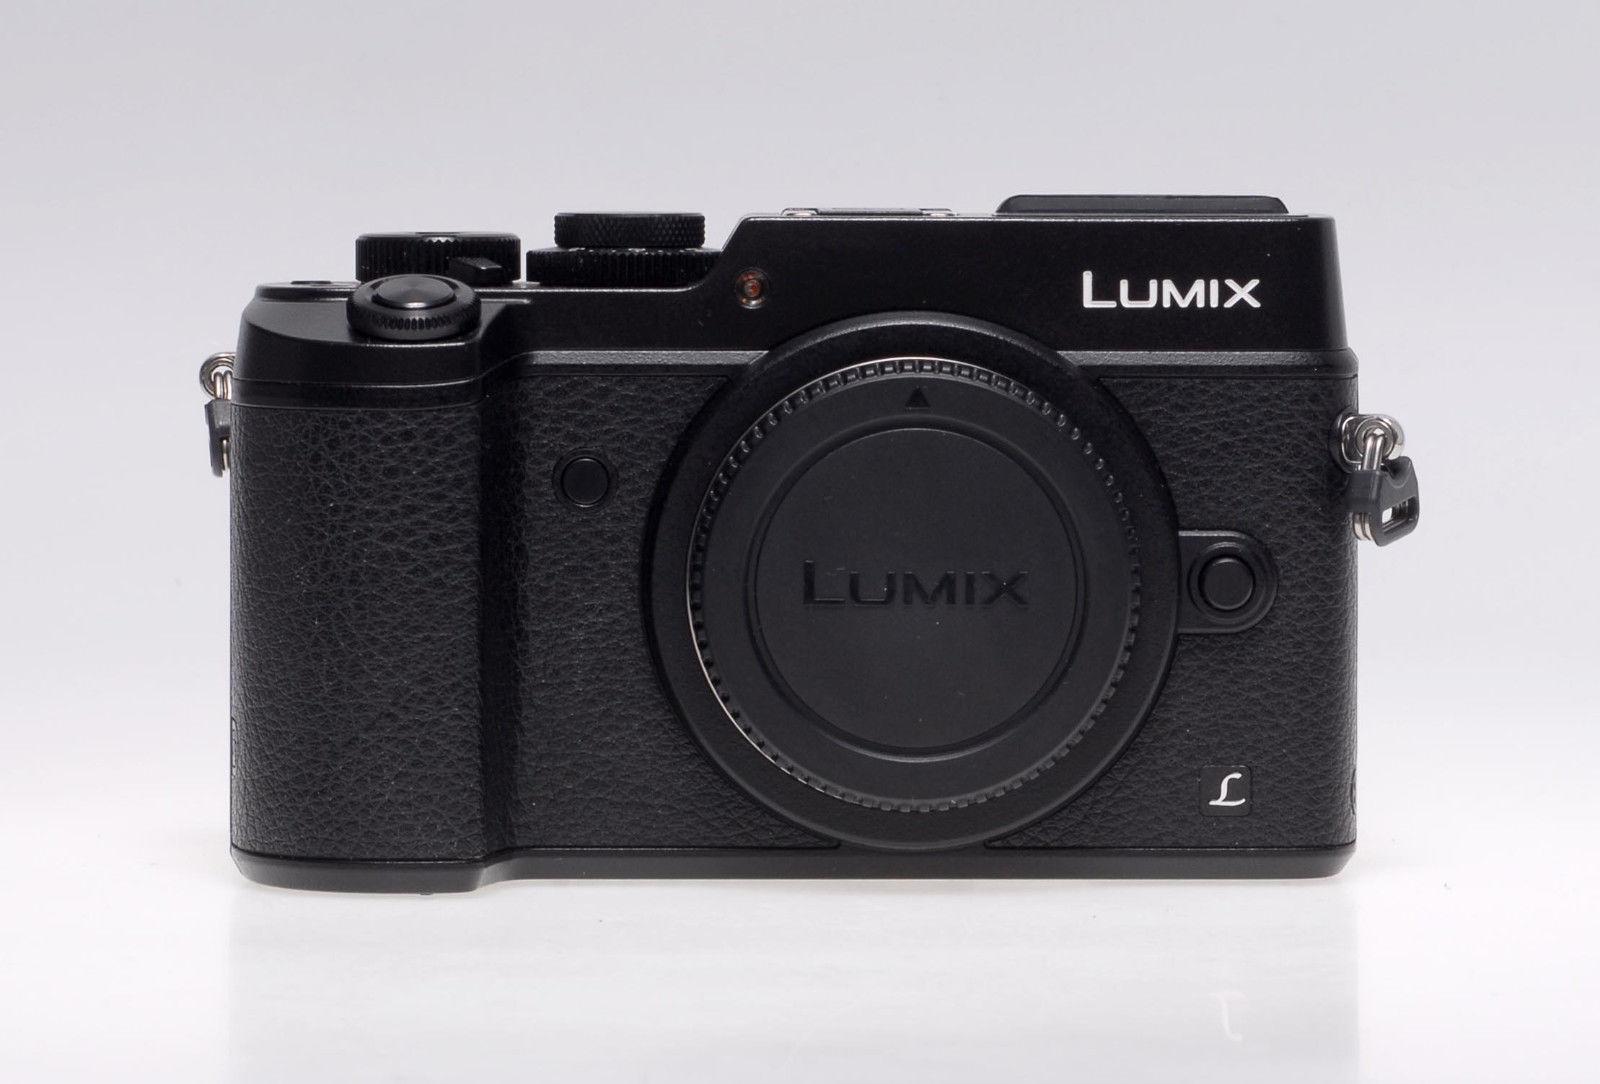 Panasonic LUMIX DMC-GX8 20.3MP Digitalkamera - Schwarz  - gebraucht